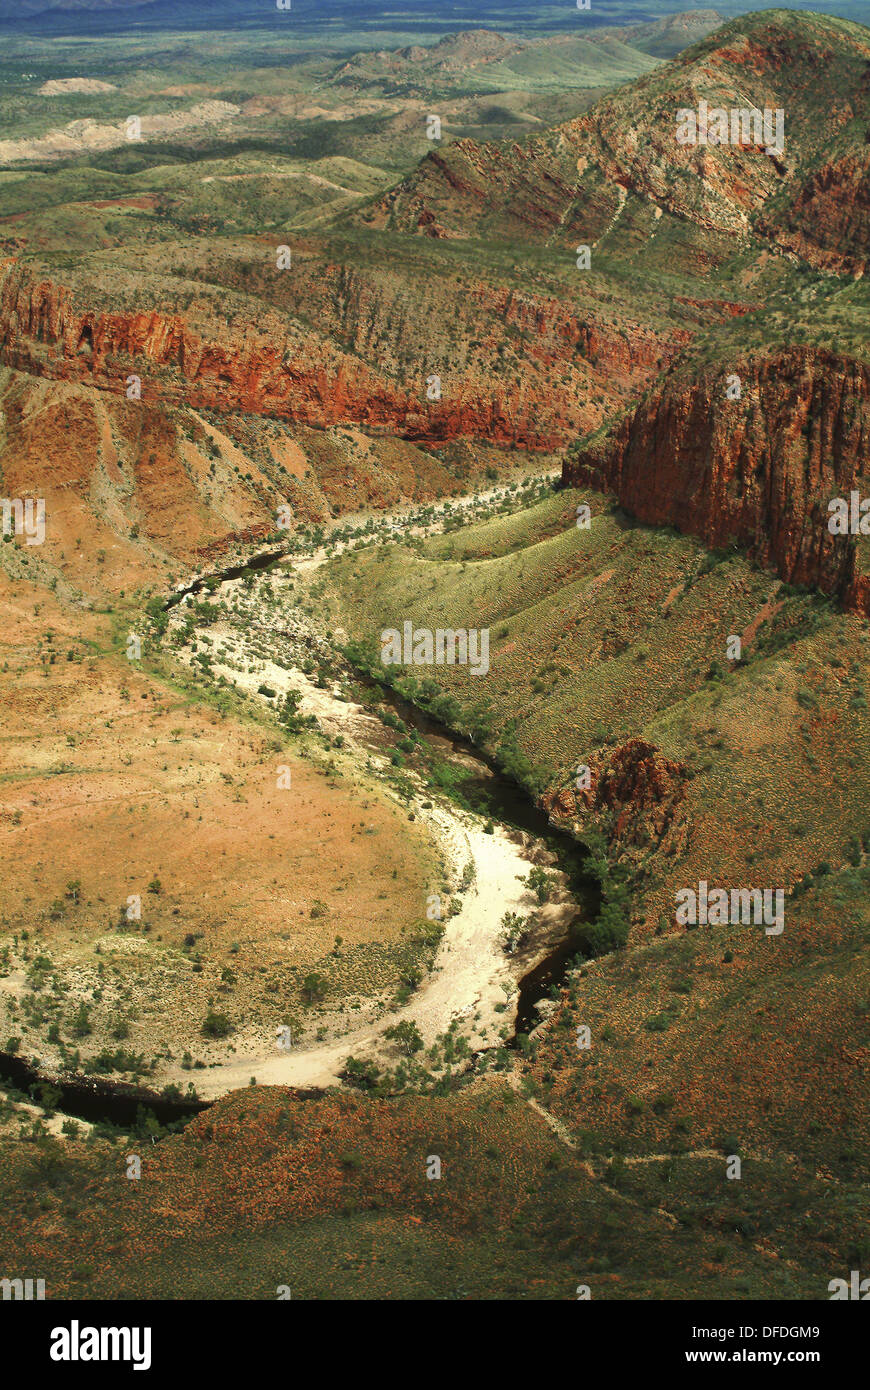 MacDonnell Ranges, Northern Territory, Australia - Stock Image